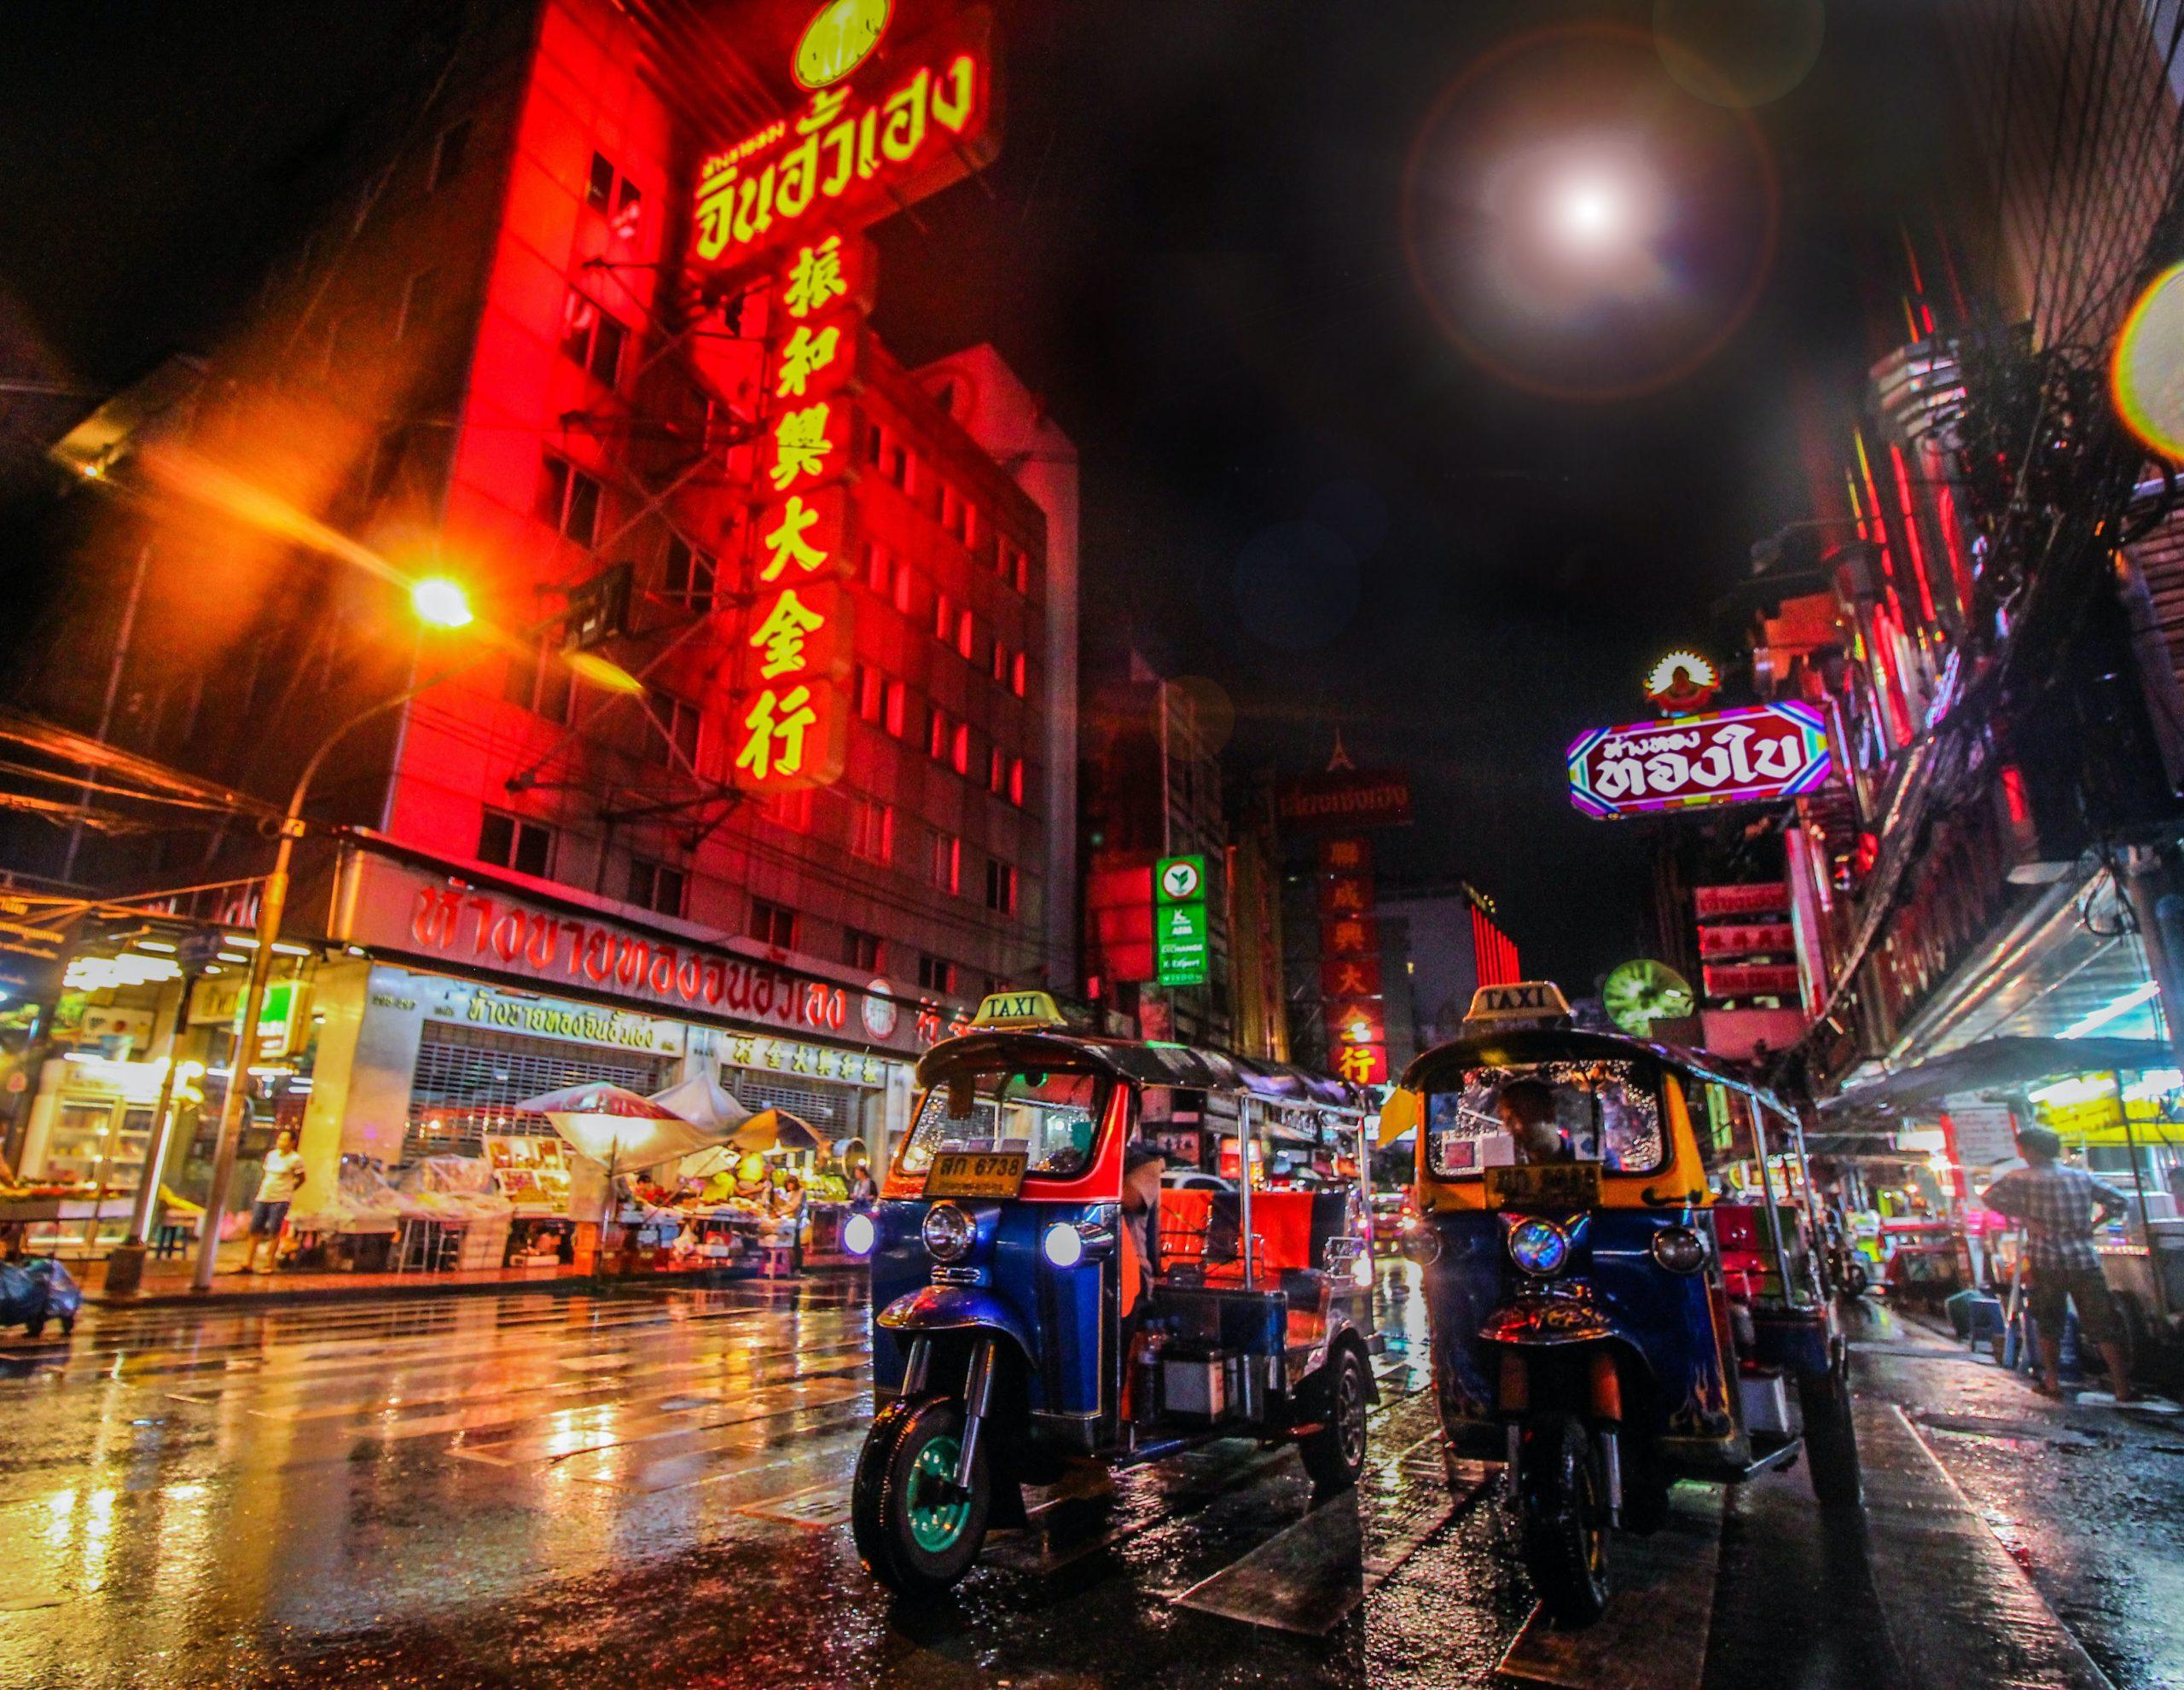 Tuk Tuk's on the street in Bangkok Thailand